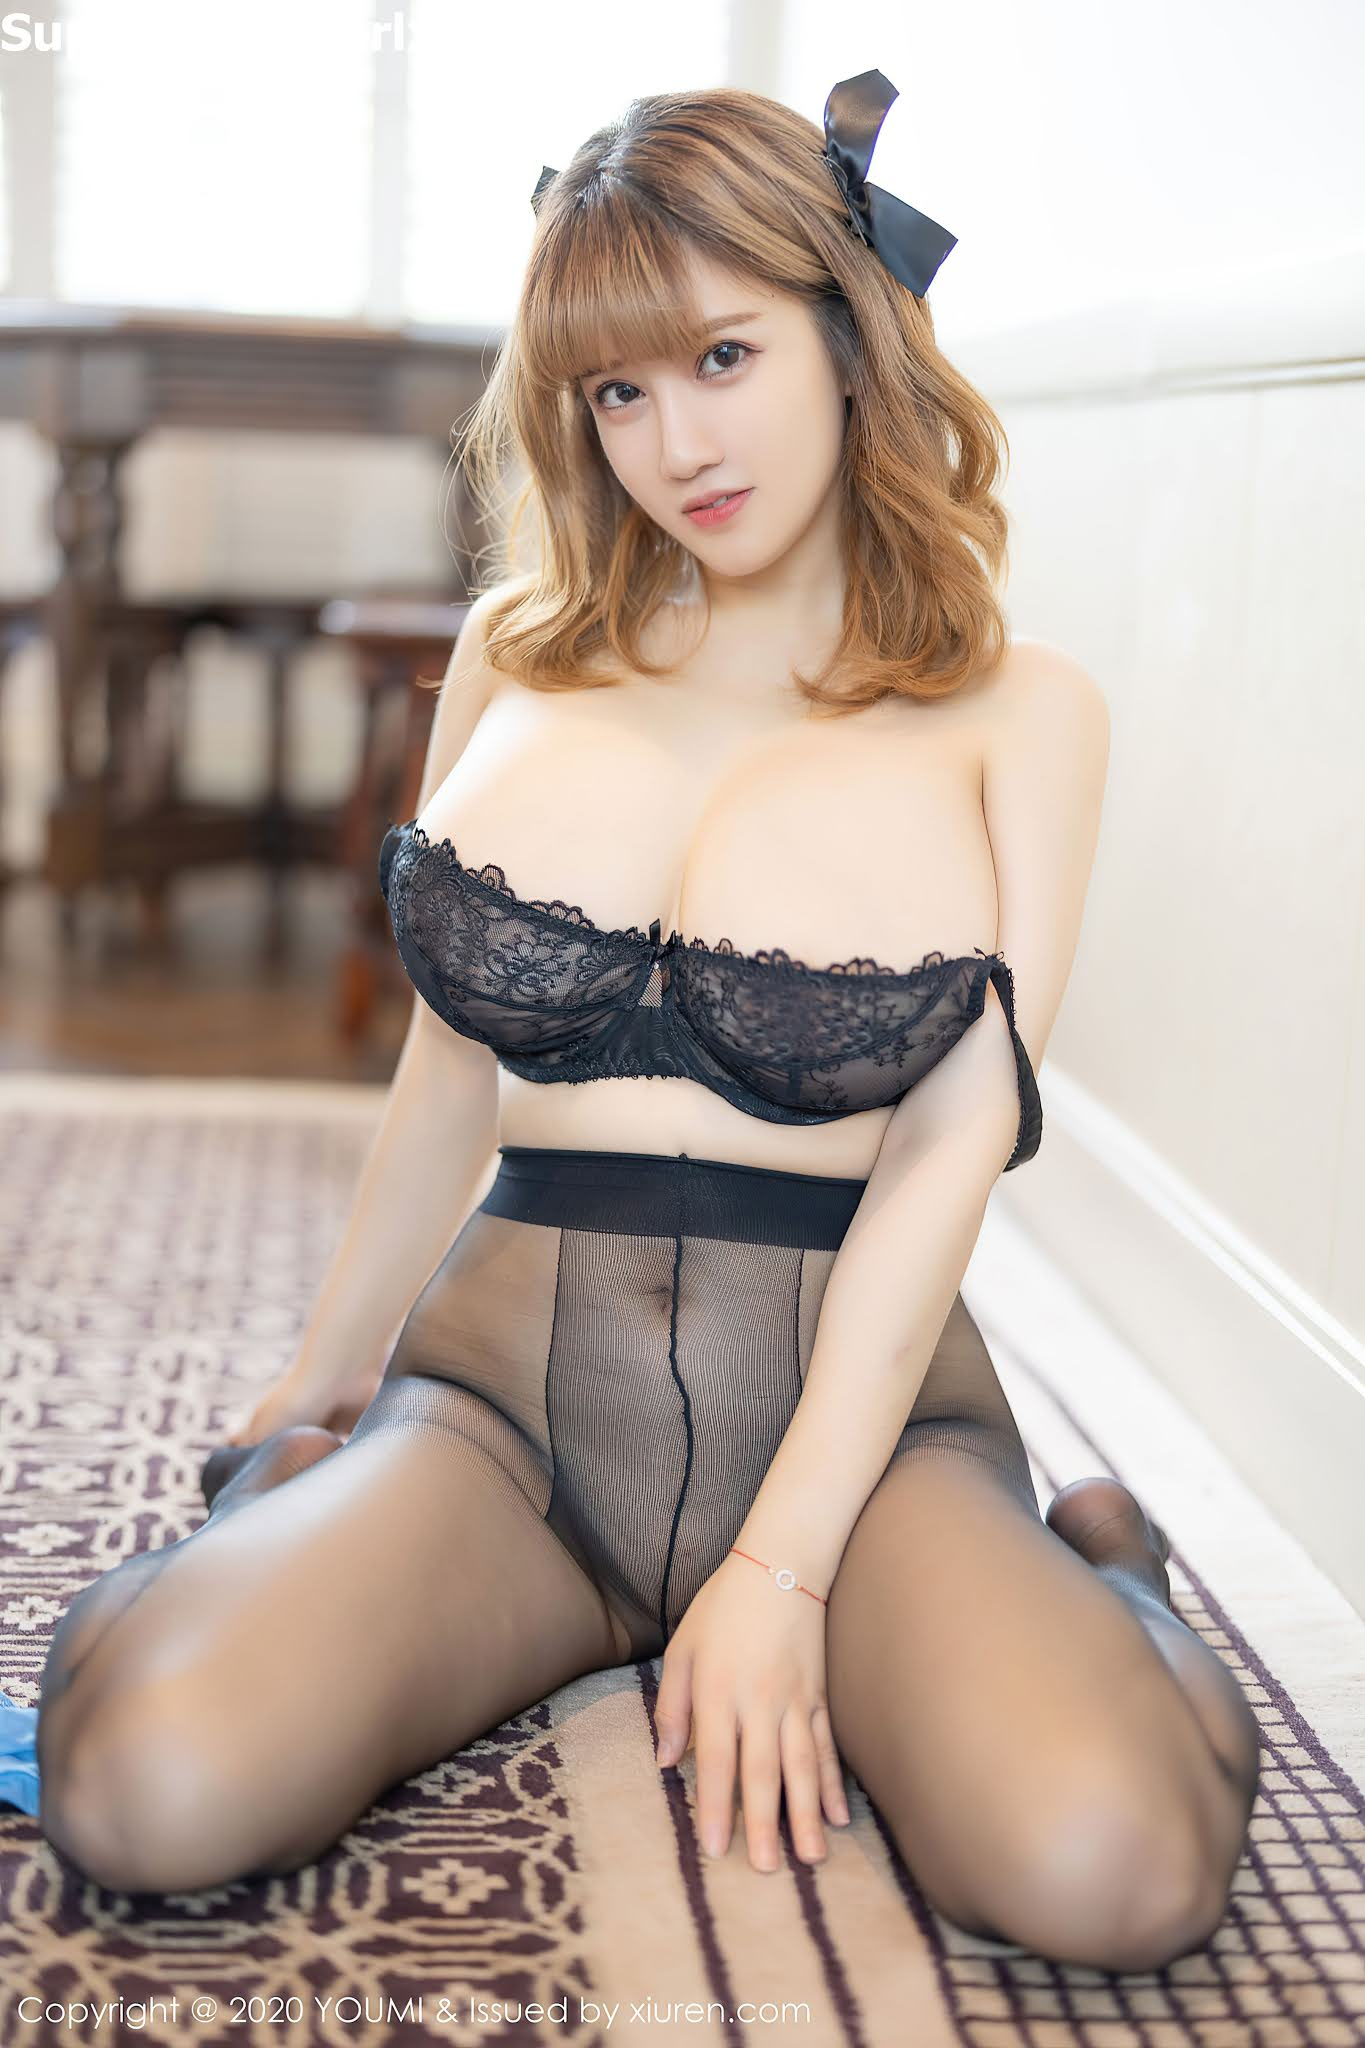 YouMi-Vol.572-Zhou-Da-Meng-Superbeautygirlx.com